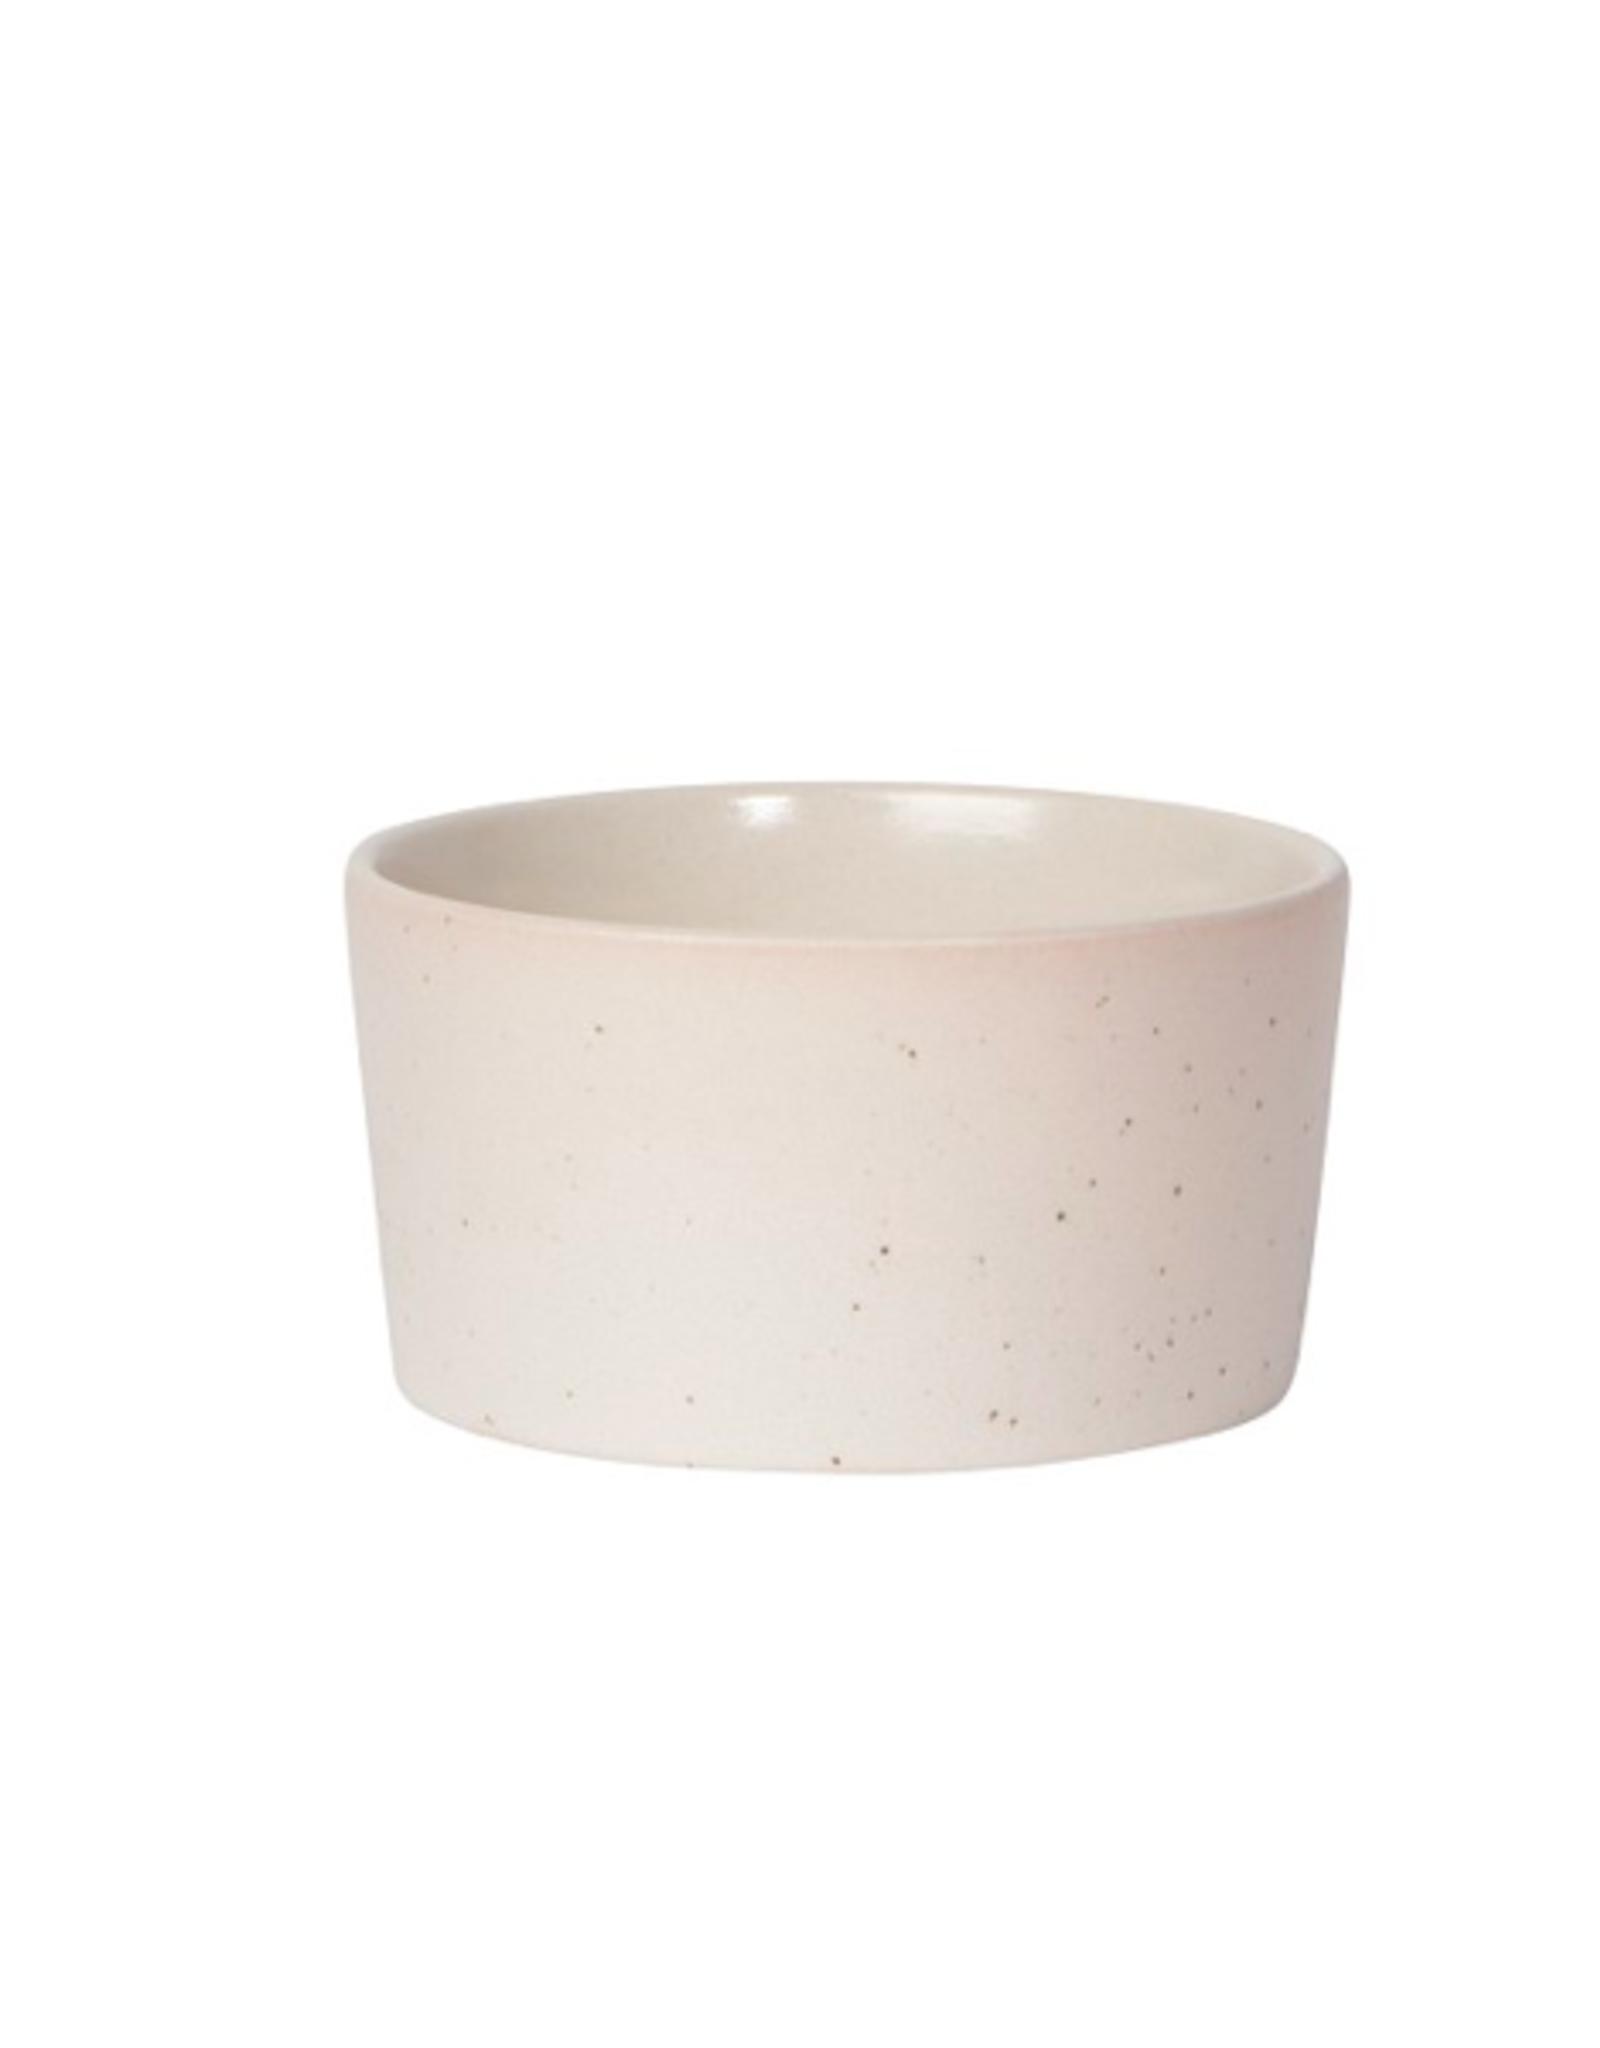 DCA - Ramekin/Soft Speckle, Sand, 7oz